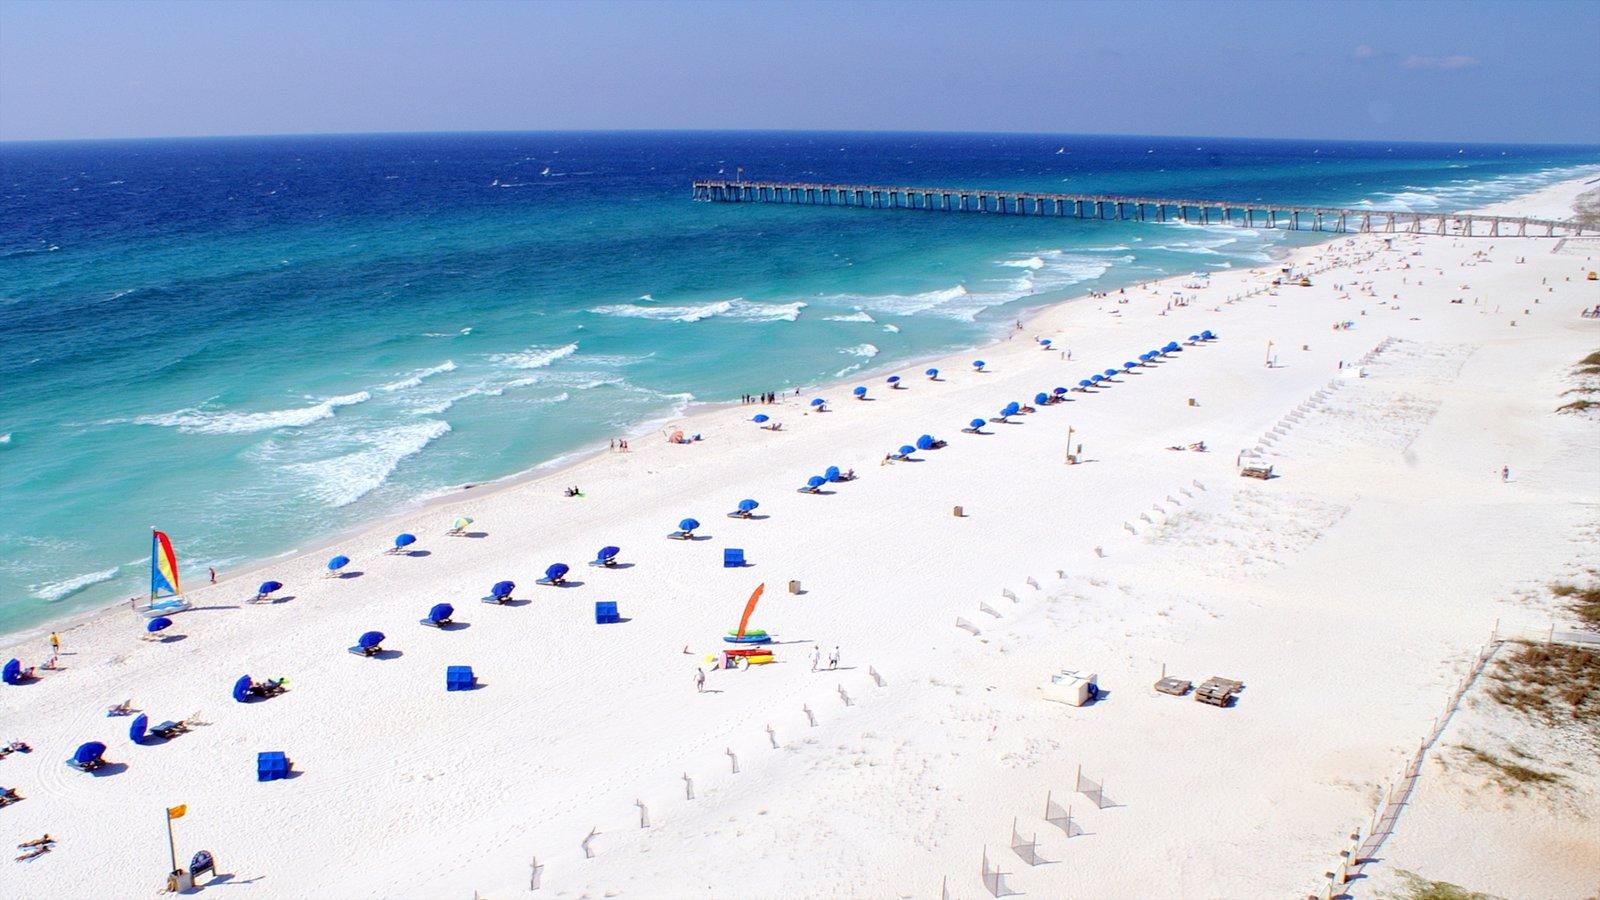 Pensacola Beach showing a beach